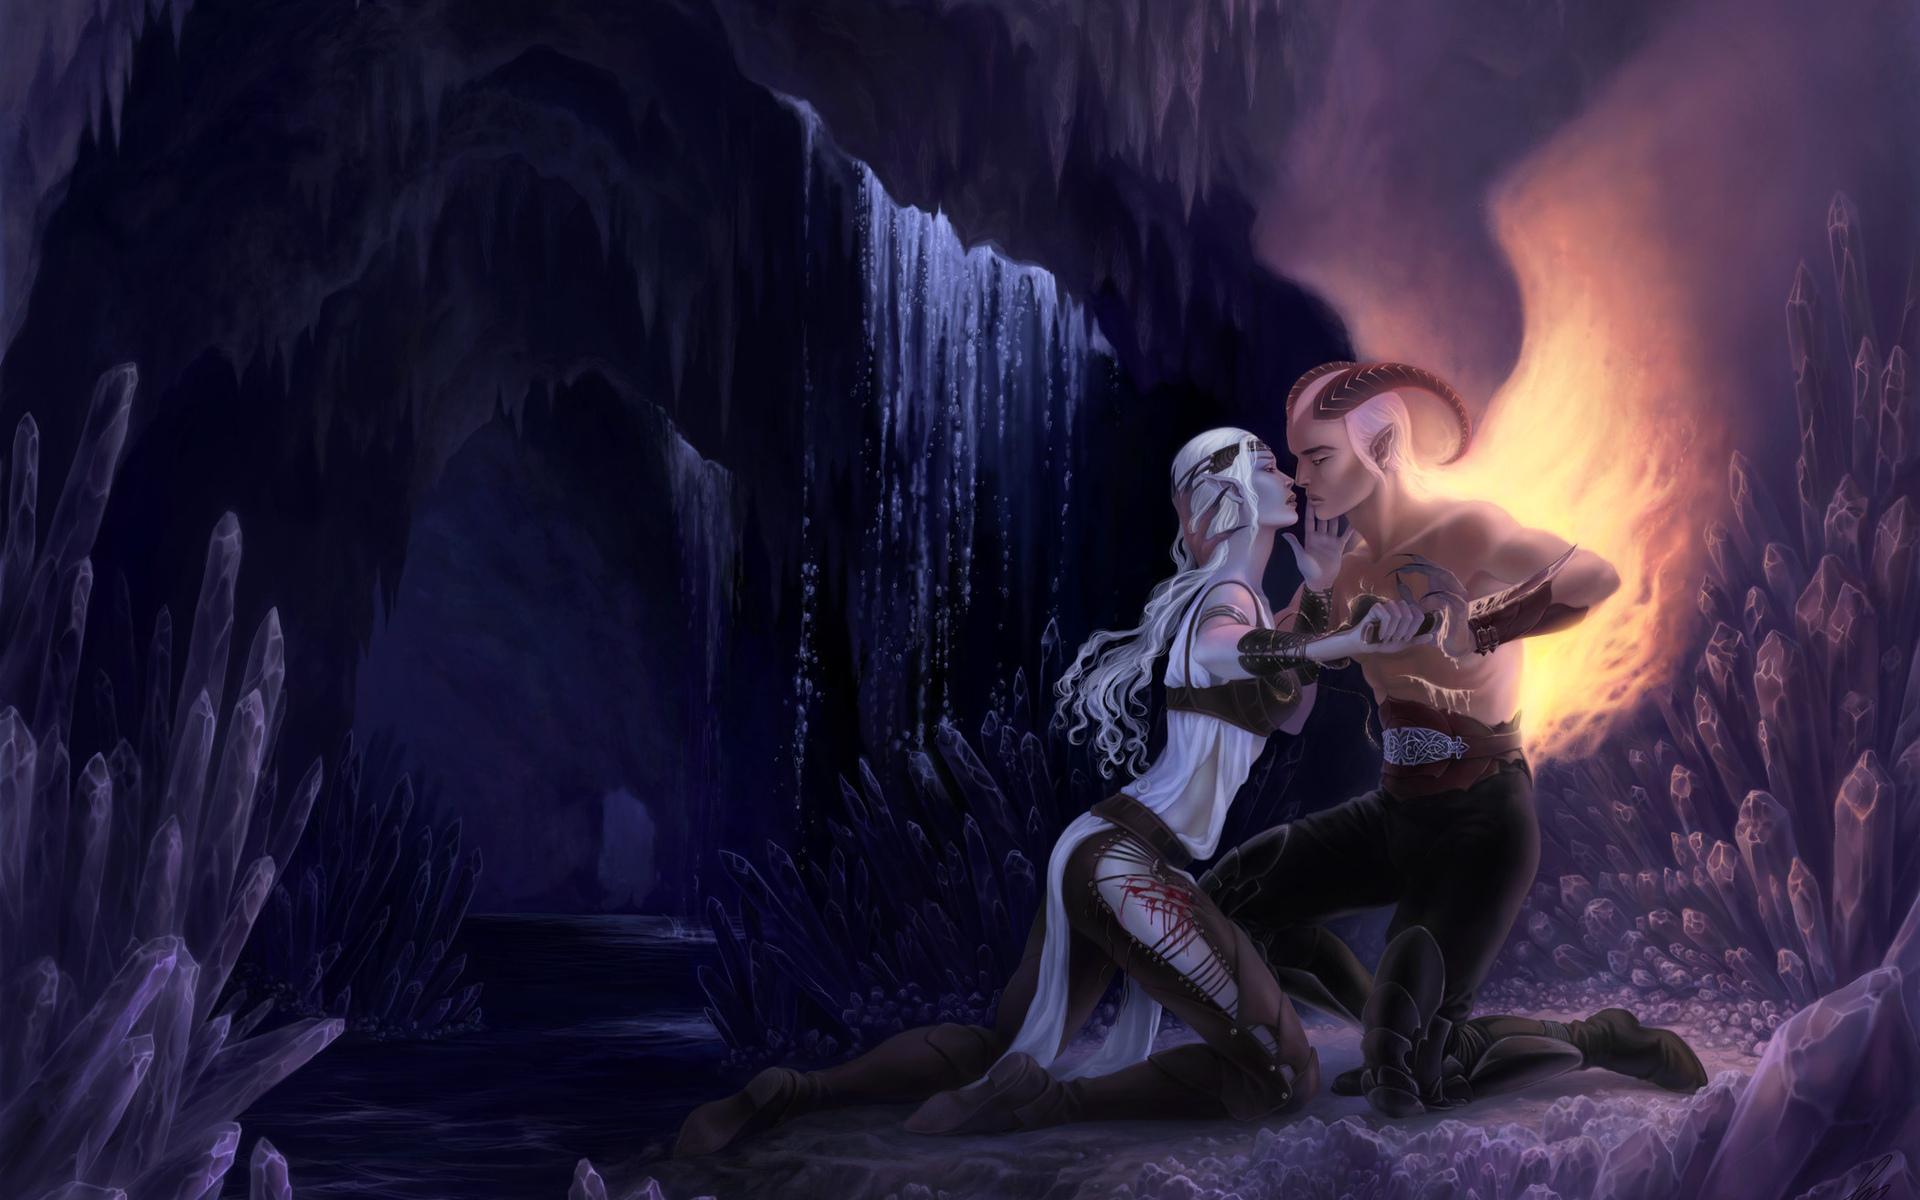 Fantasy women evil - photo#26